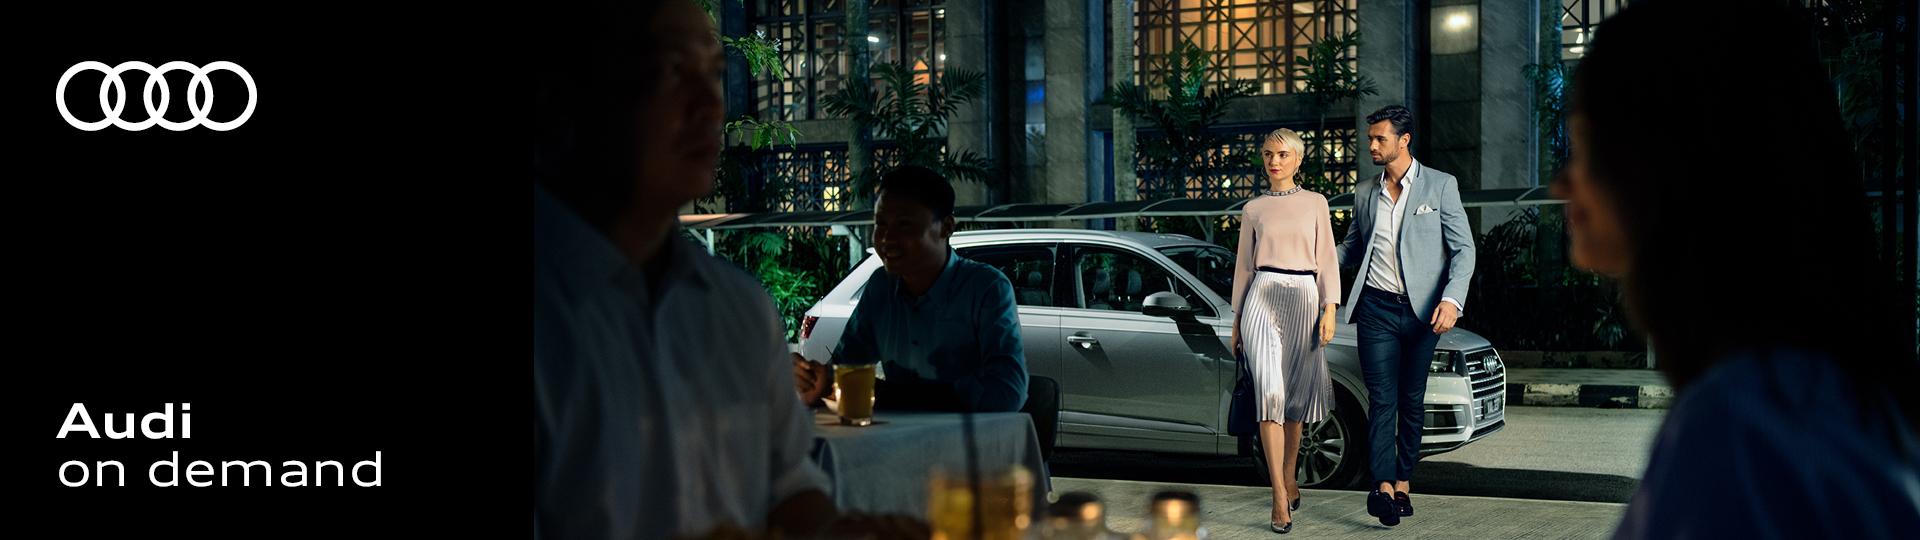 Audi-on-demand